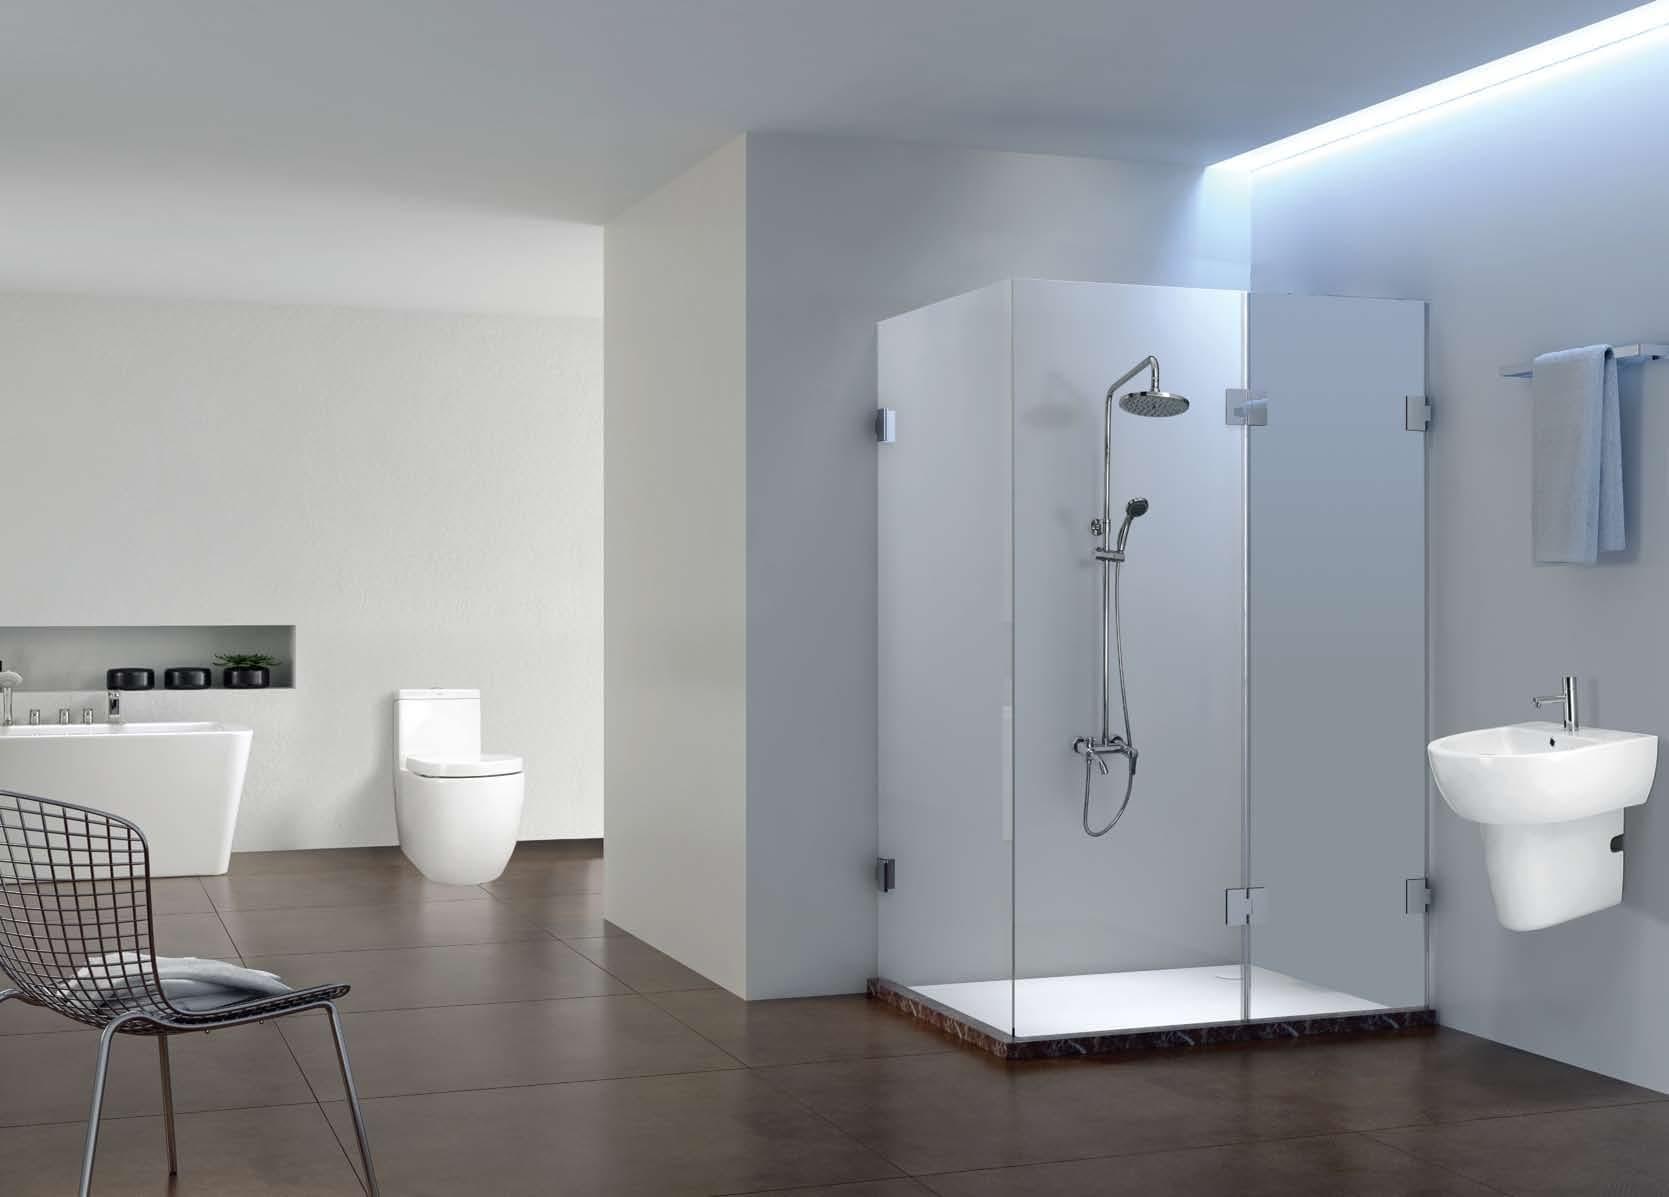 Building Glass, Faucet, Teracotta tiles, Ceramic tiles, Sanitary ...